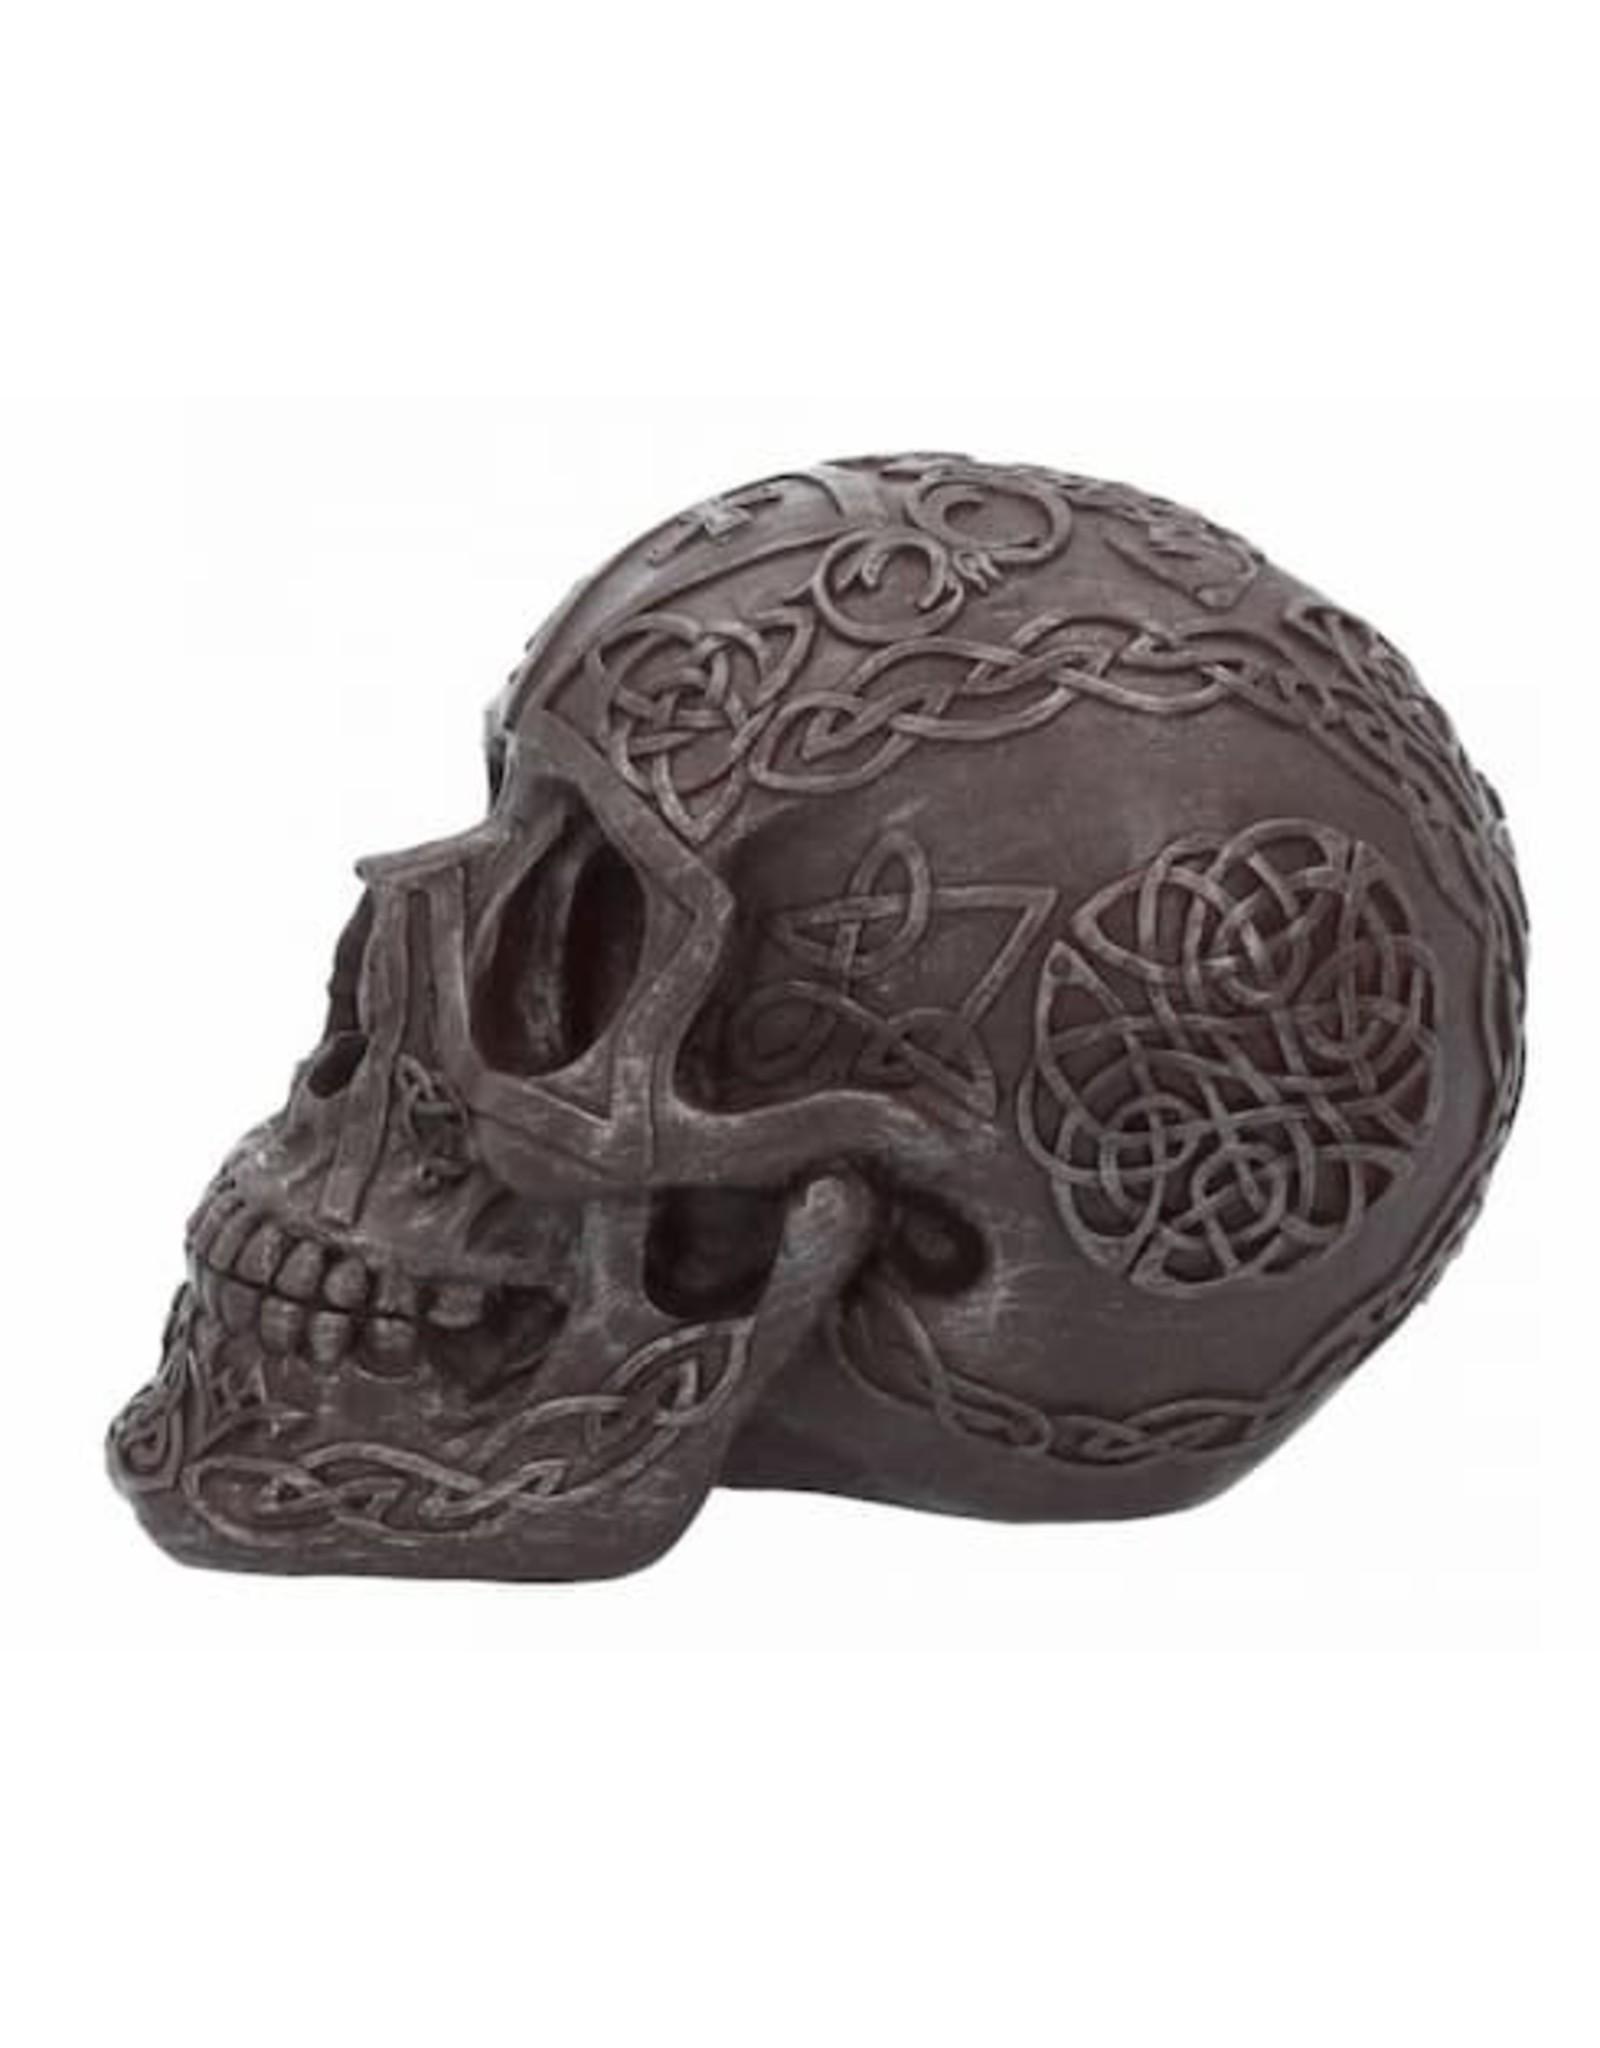 Alator Schedels - Schedel Celtic Iron - Nemesis Now